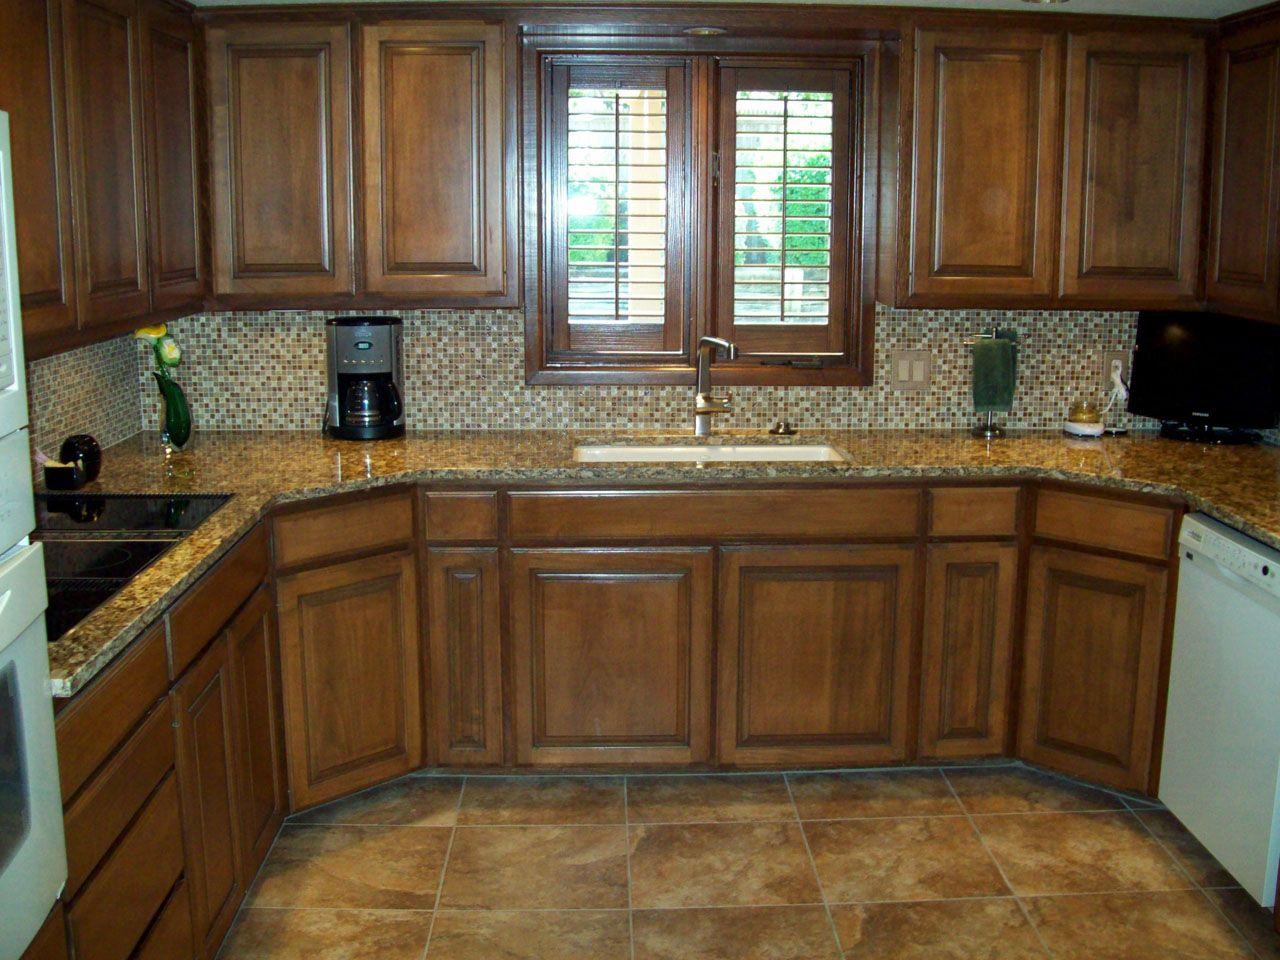 70+ Basic Kitchen Remodel - Favorite Interior Paint Colors Check ...